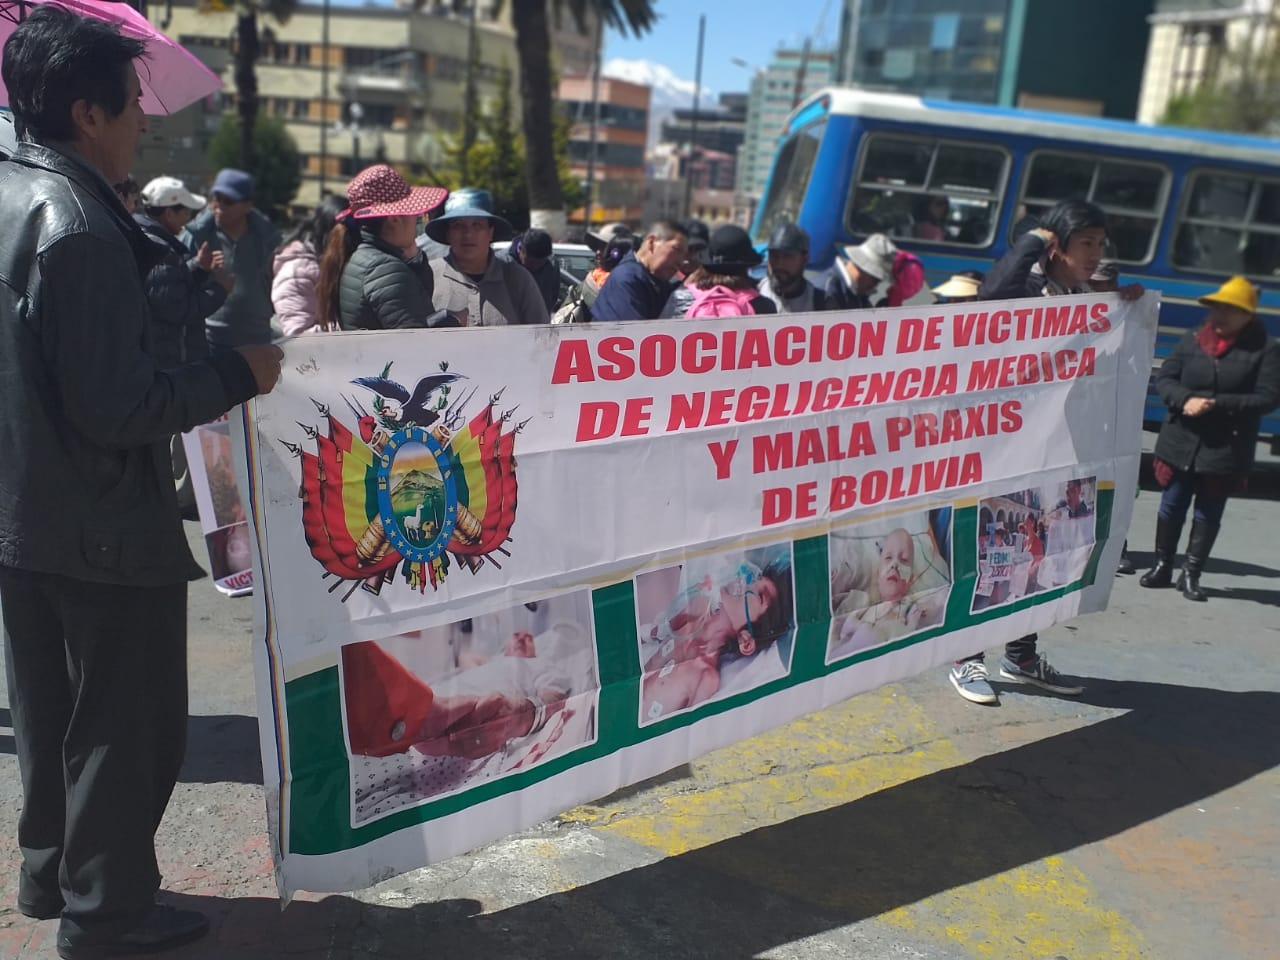 Asociación de Víctimas de Negligencia Médica exige reunión con Montaño para tratar un proyecto de ley